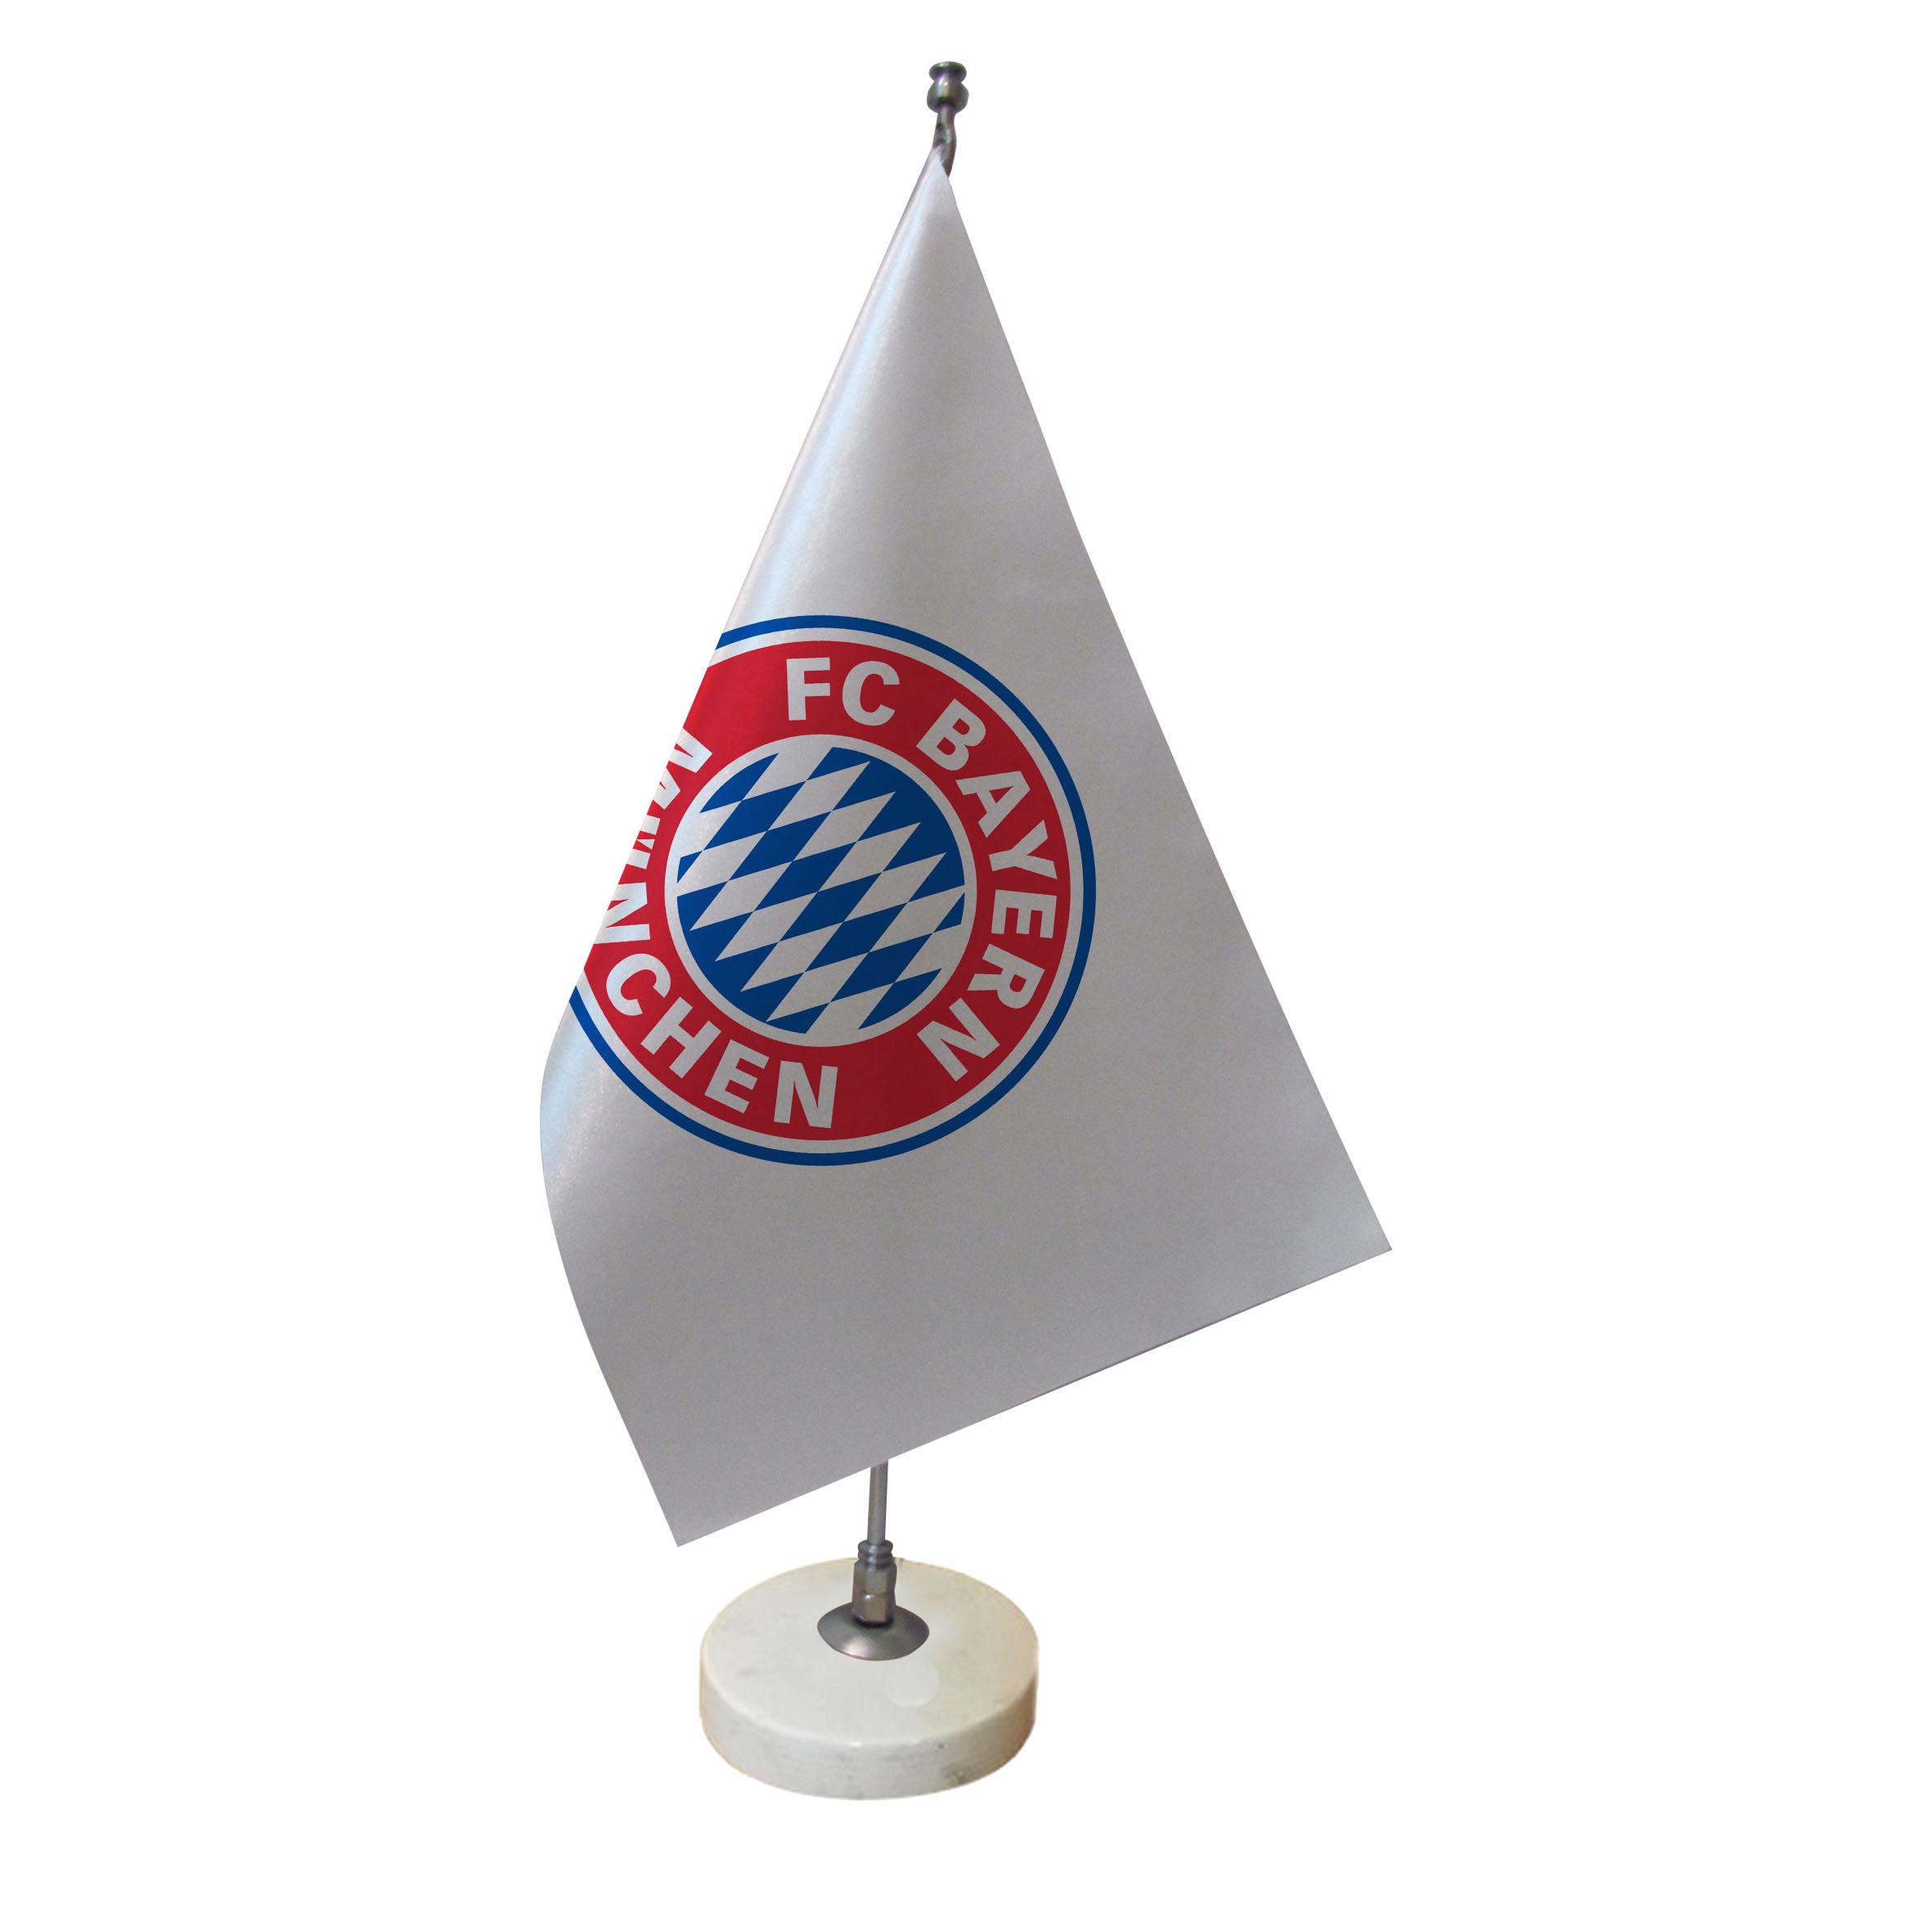 خرید                      پرچم رومیزی طرح  تیم فوتبال بایرن مونیخ کد pr29